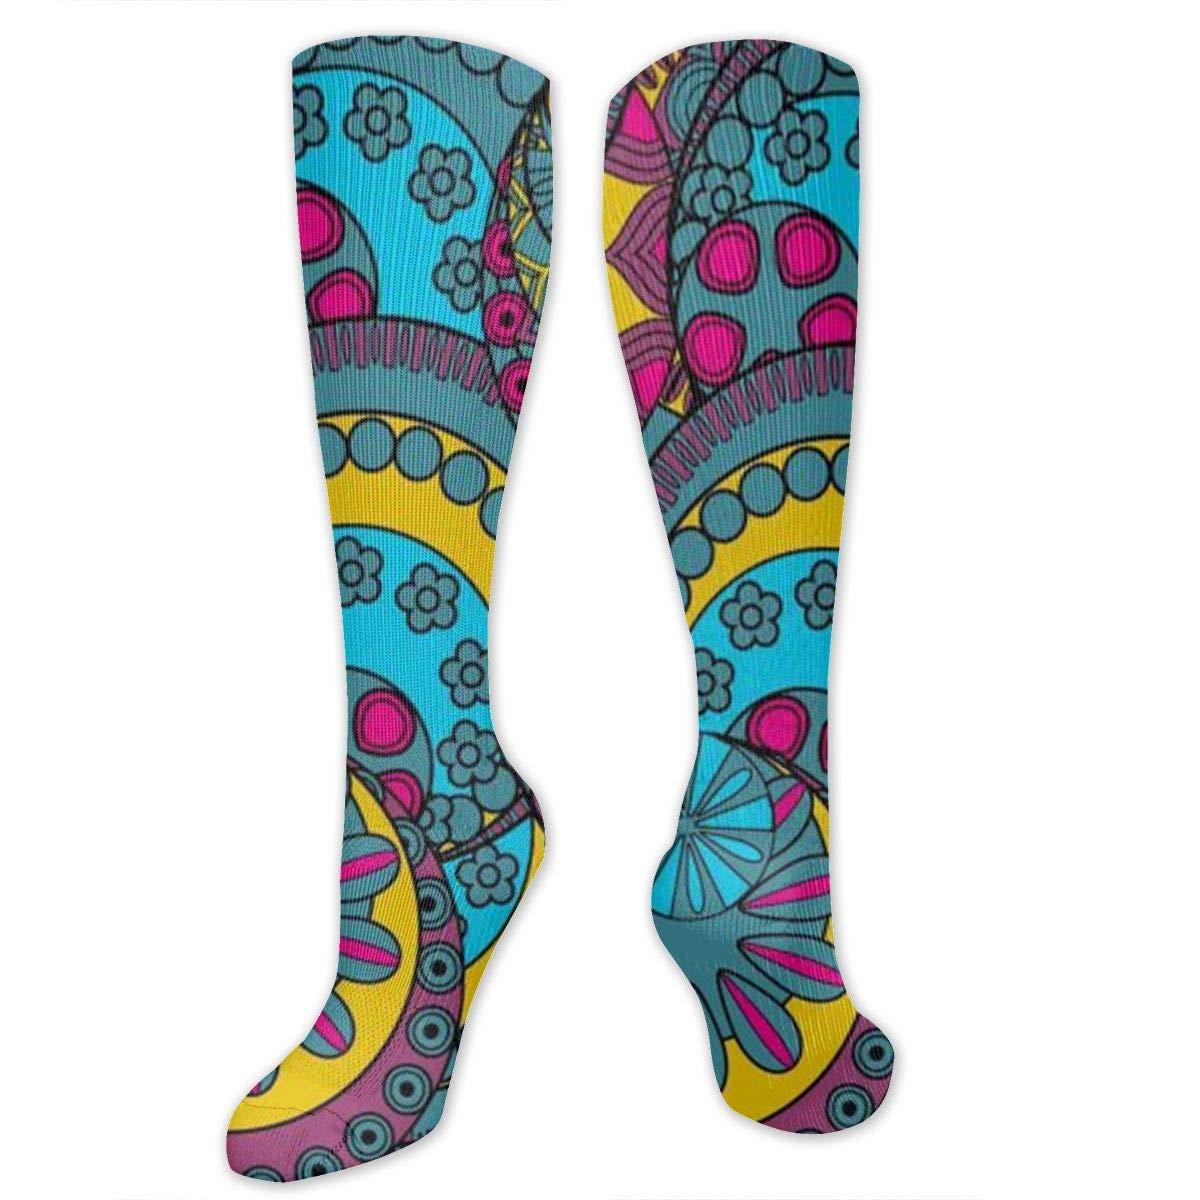 Men Multicolored Pattern Fashionable Fun Crew Cotton Socks Chanwazibibiliu Classic Decorative Pattern Mens Colorful Dress Socks Funky